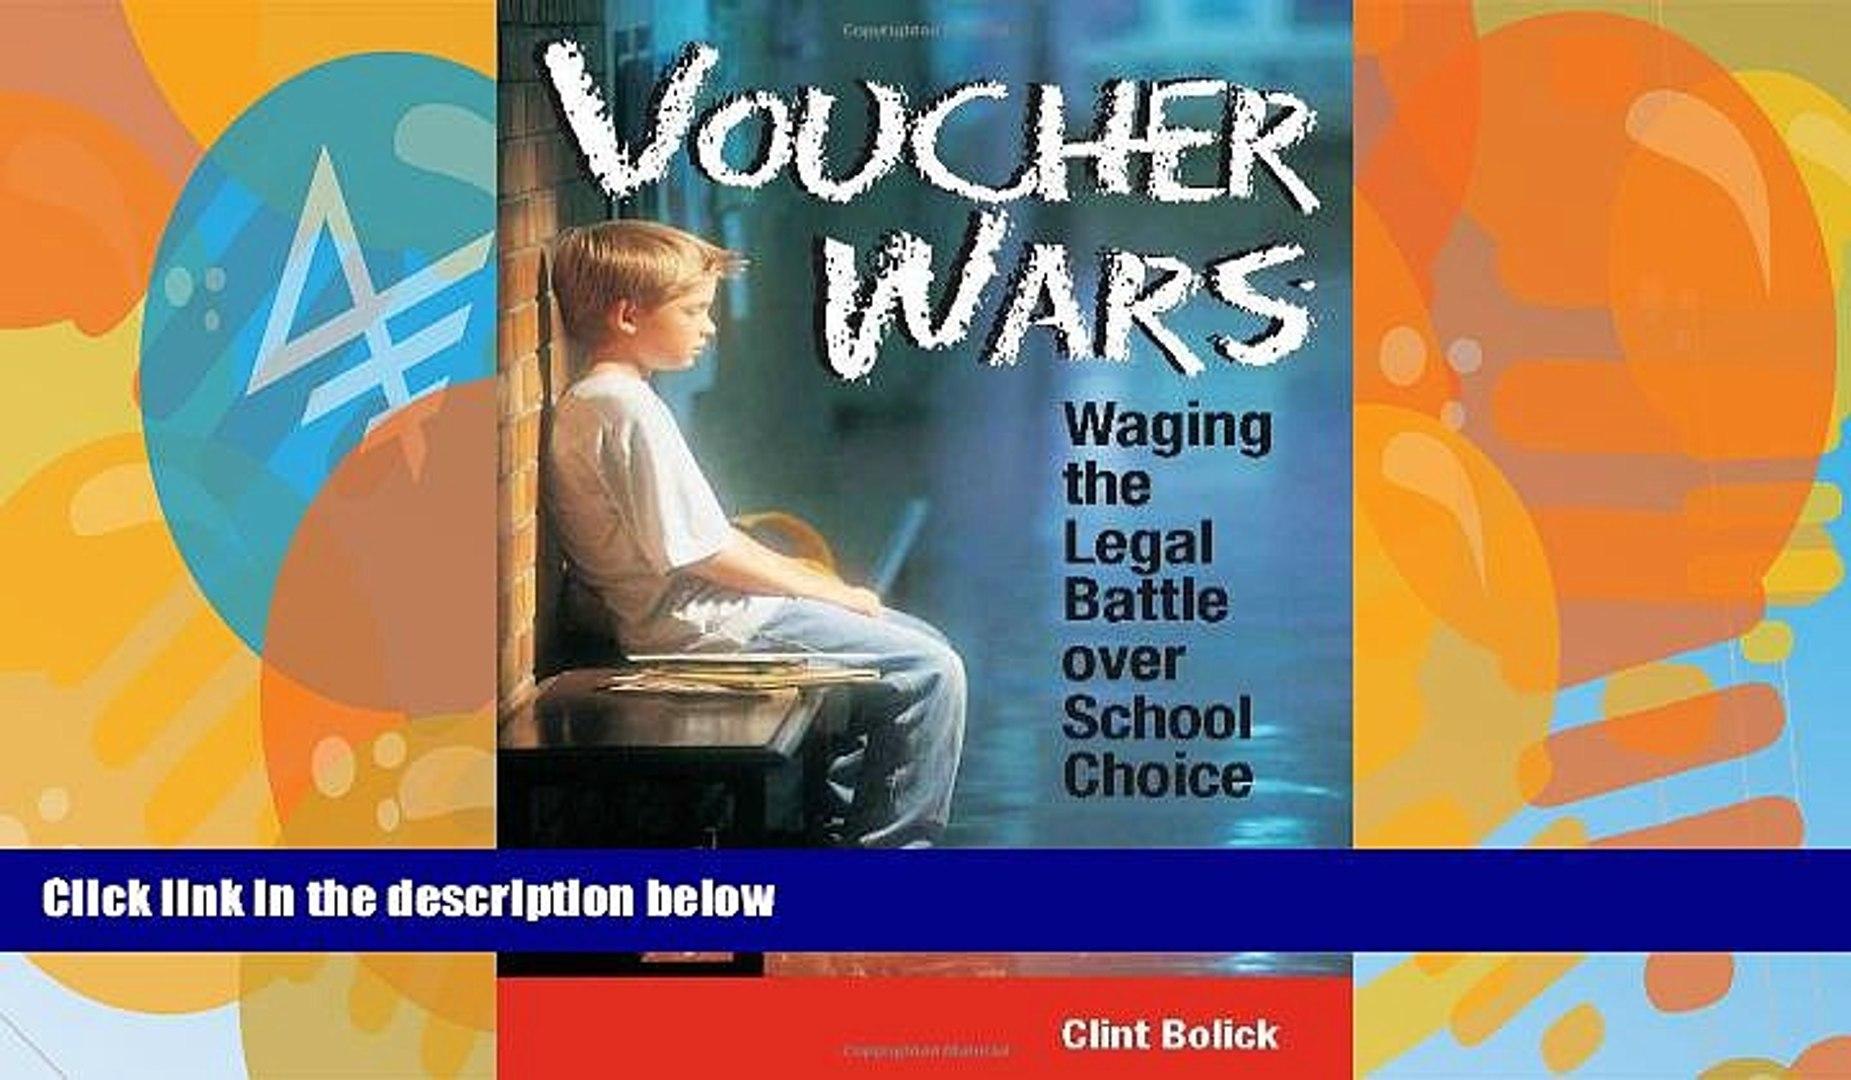 Big Deals  Voucher Wars: Waging the Legal Battle over School Choice  Best Seller Books Most Wanted